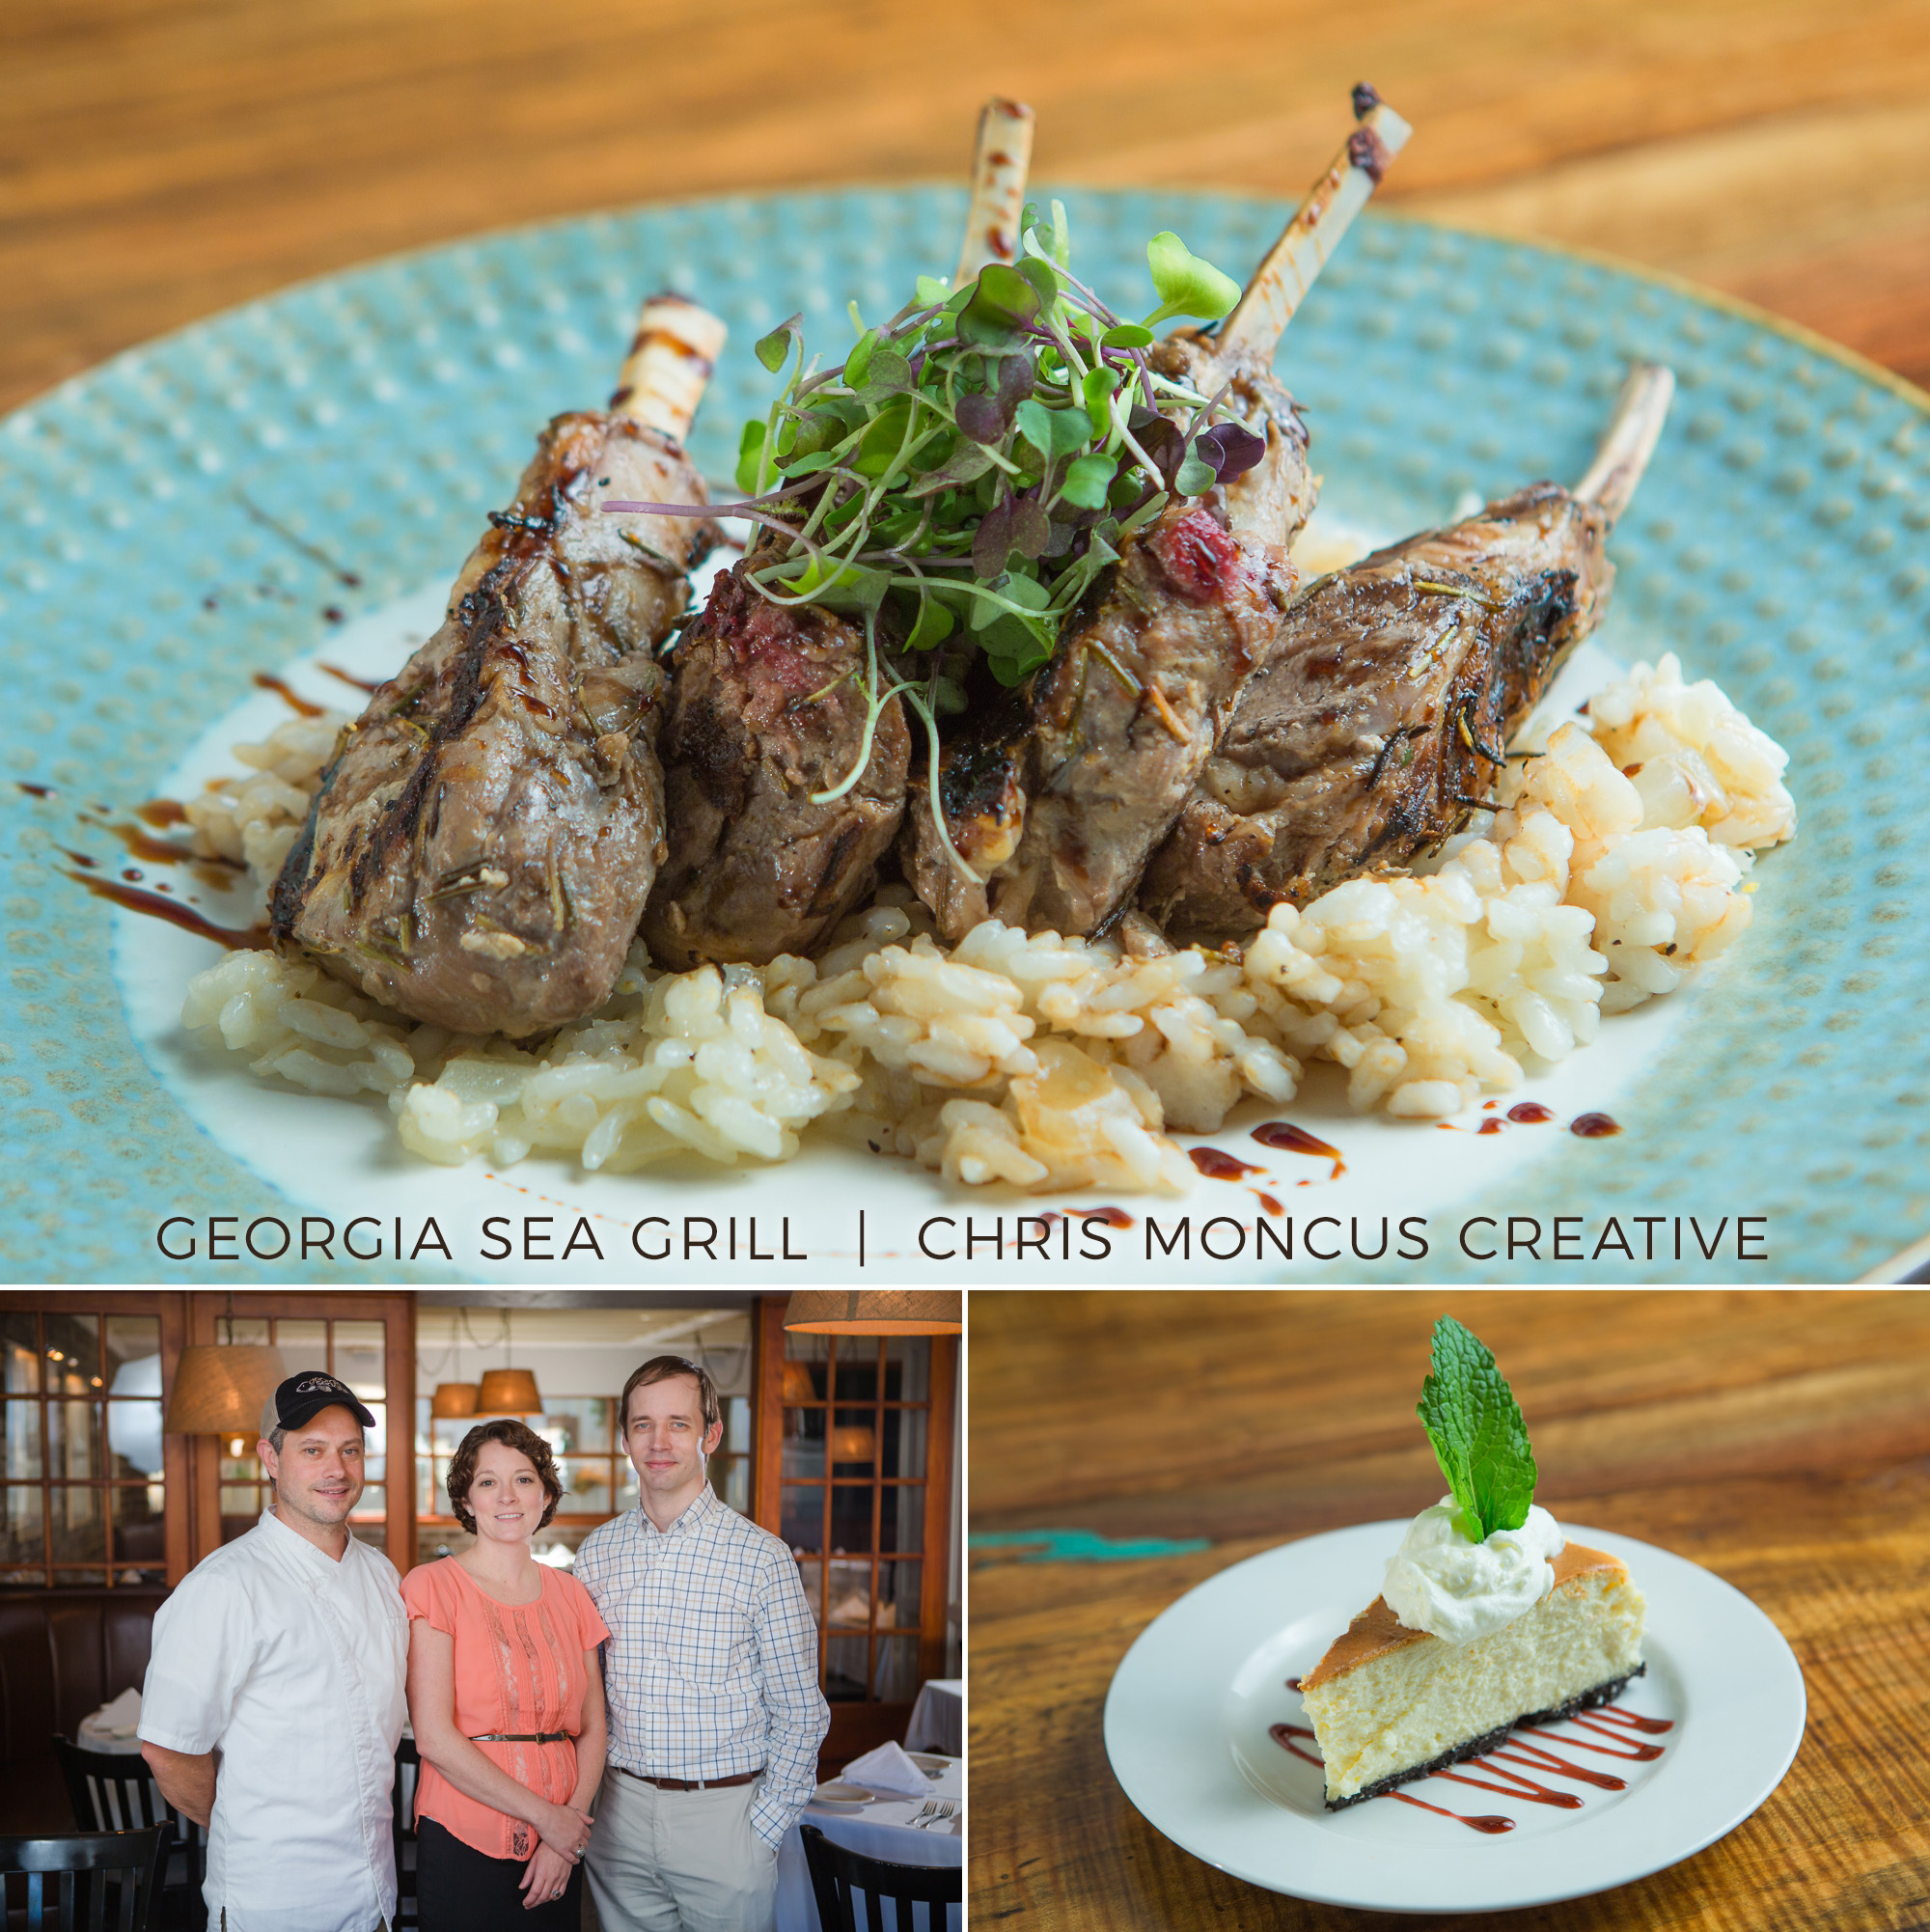 GA Sea Grill 2015-10-15 1 - Blog